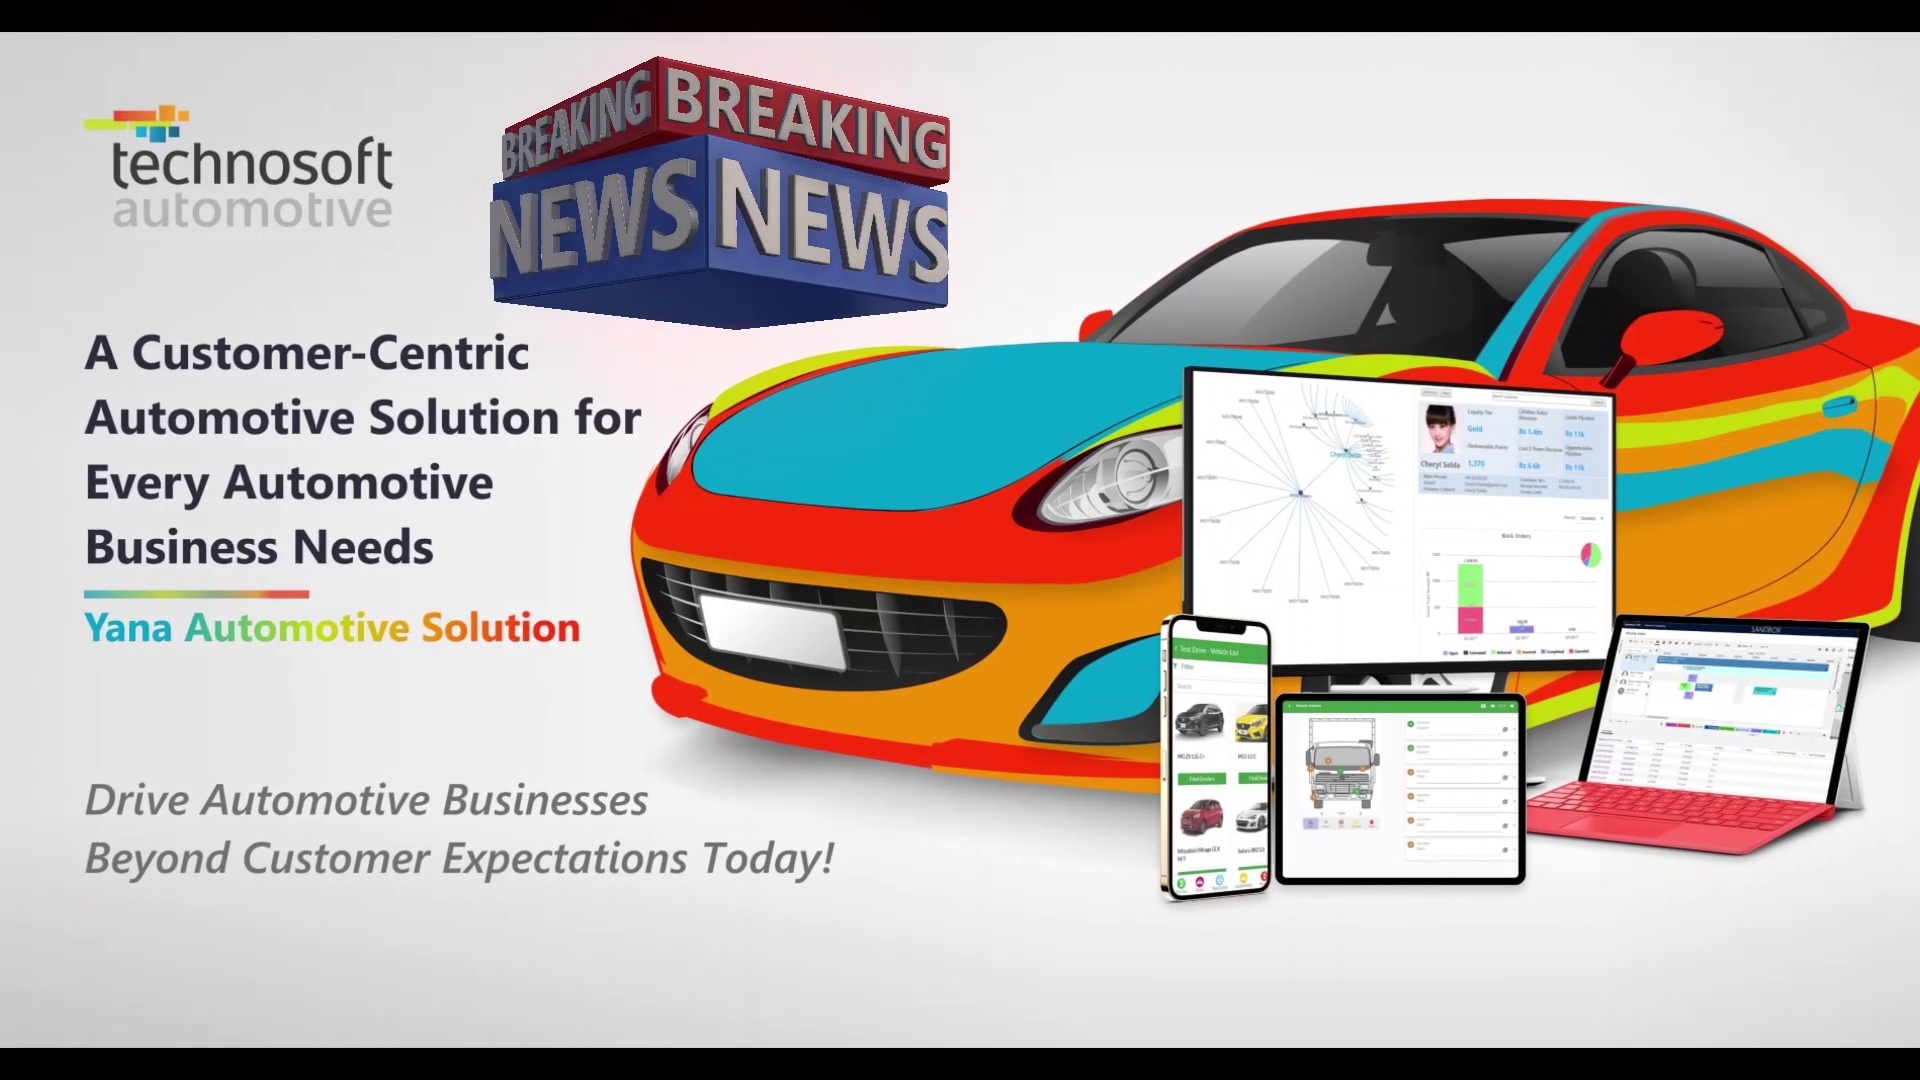 Breaking News - Introducing an Excellent Global Automotive Team | Yana Automotive Solution | Dealer Management System (DMS) | Technosoft Automotive